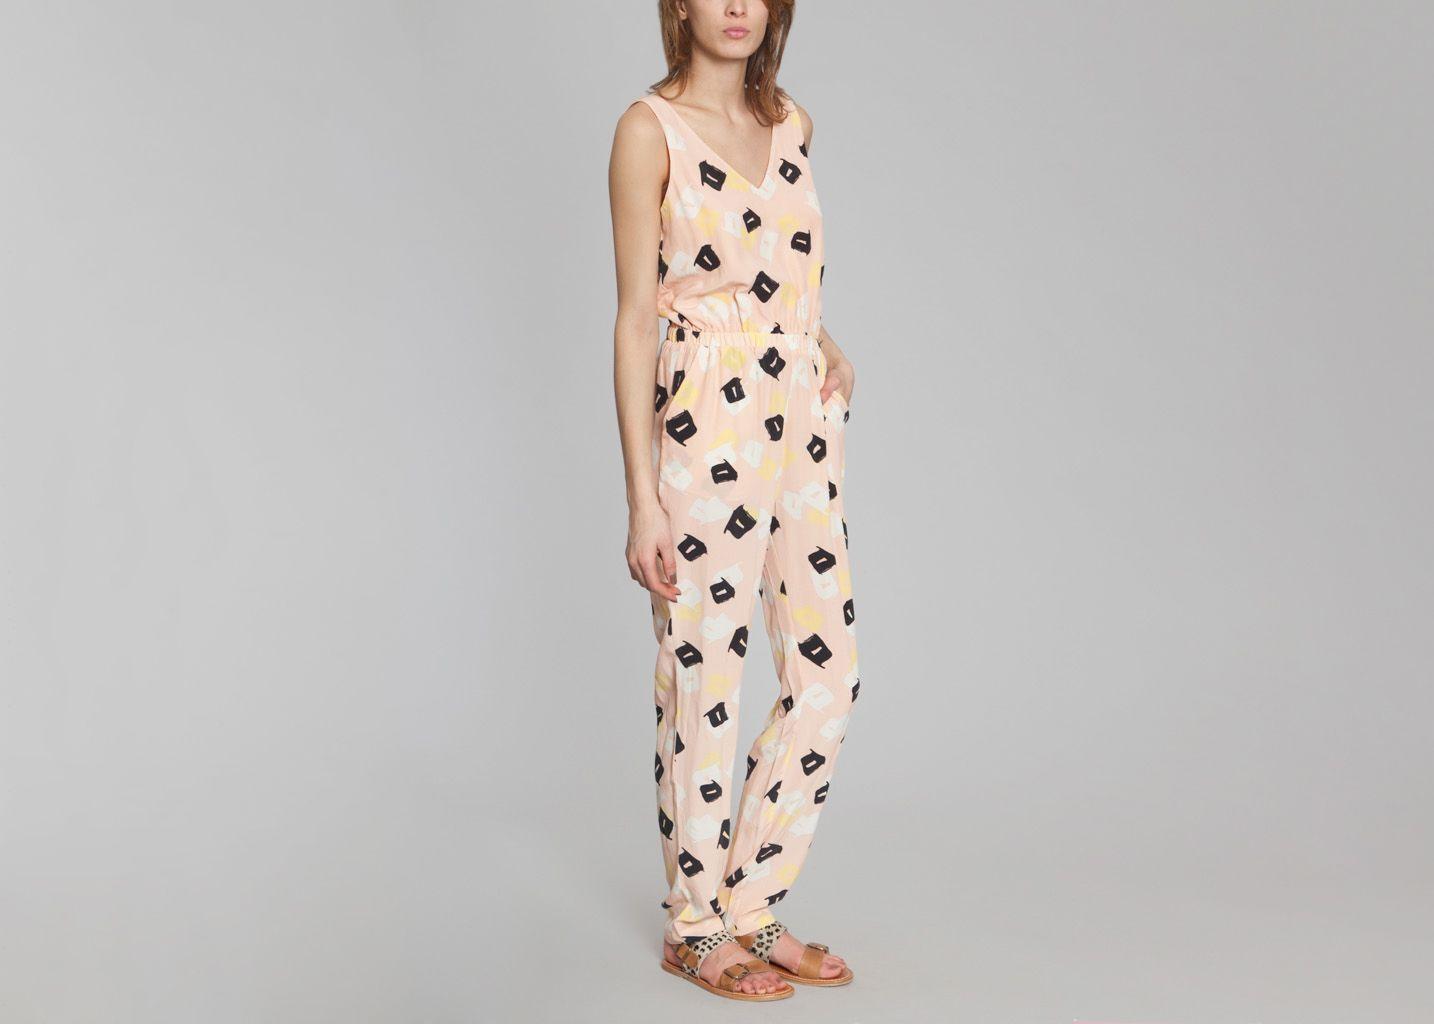 Combi Salomé - Dress Gallery